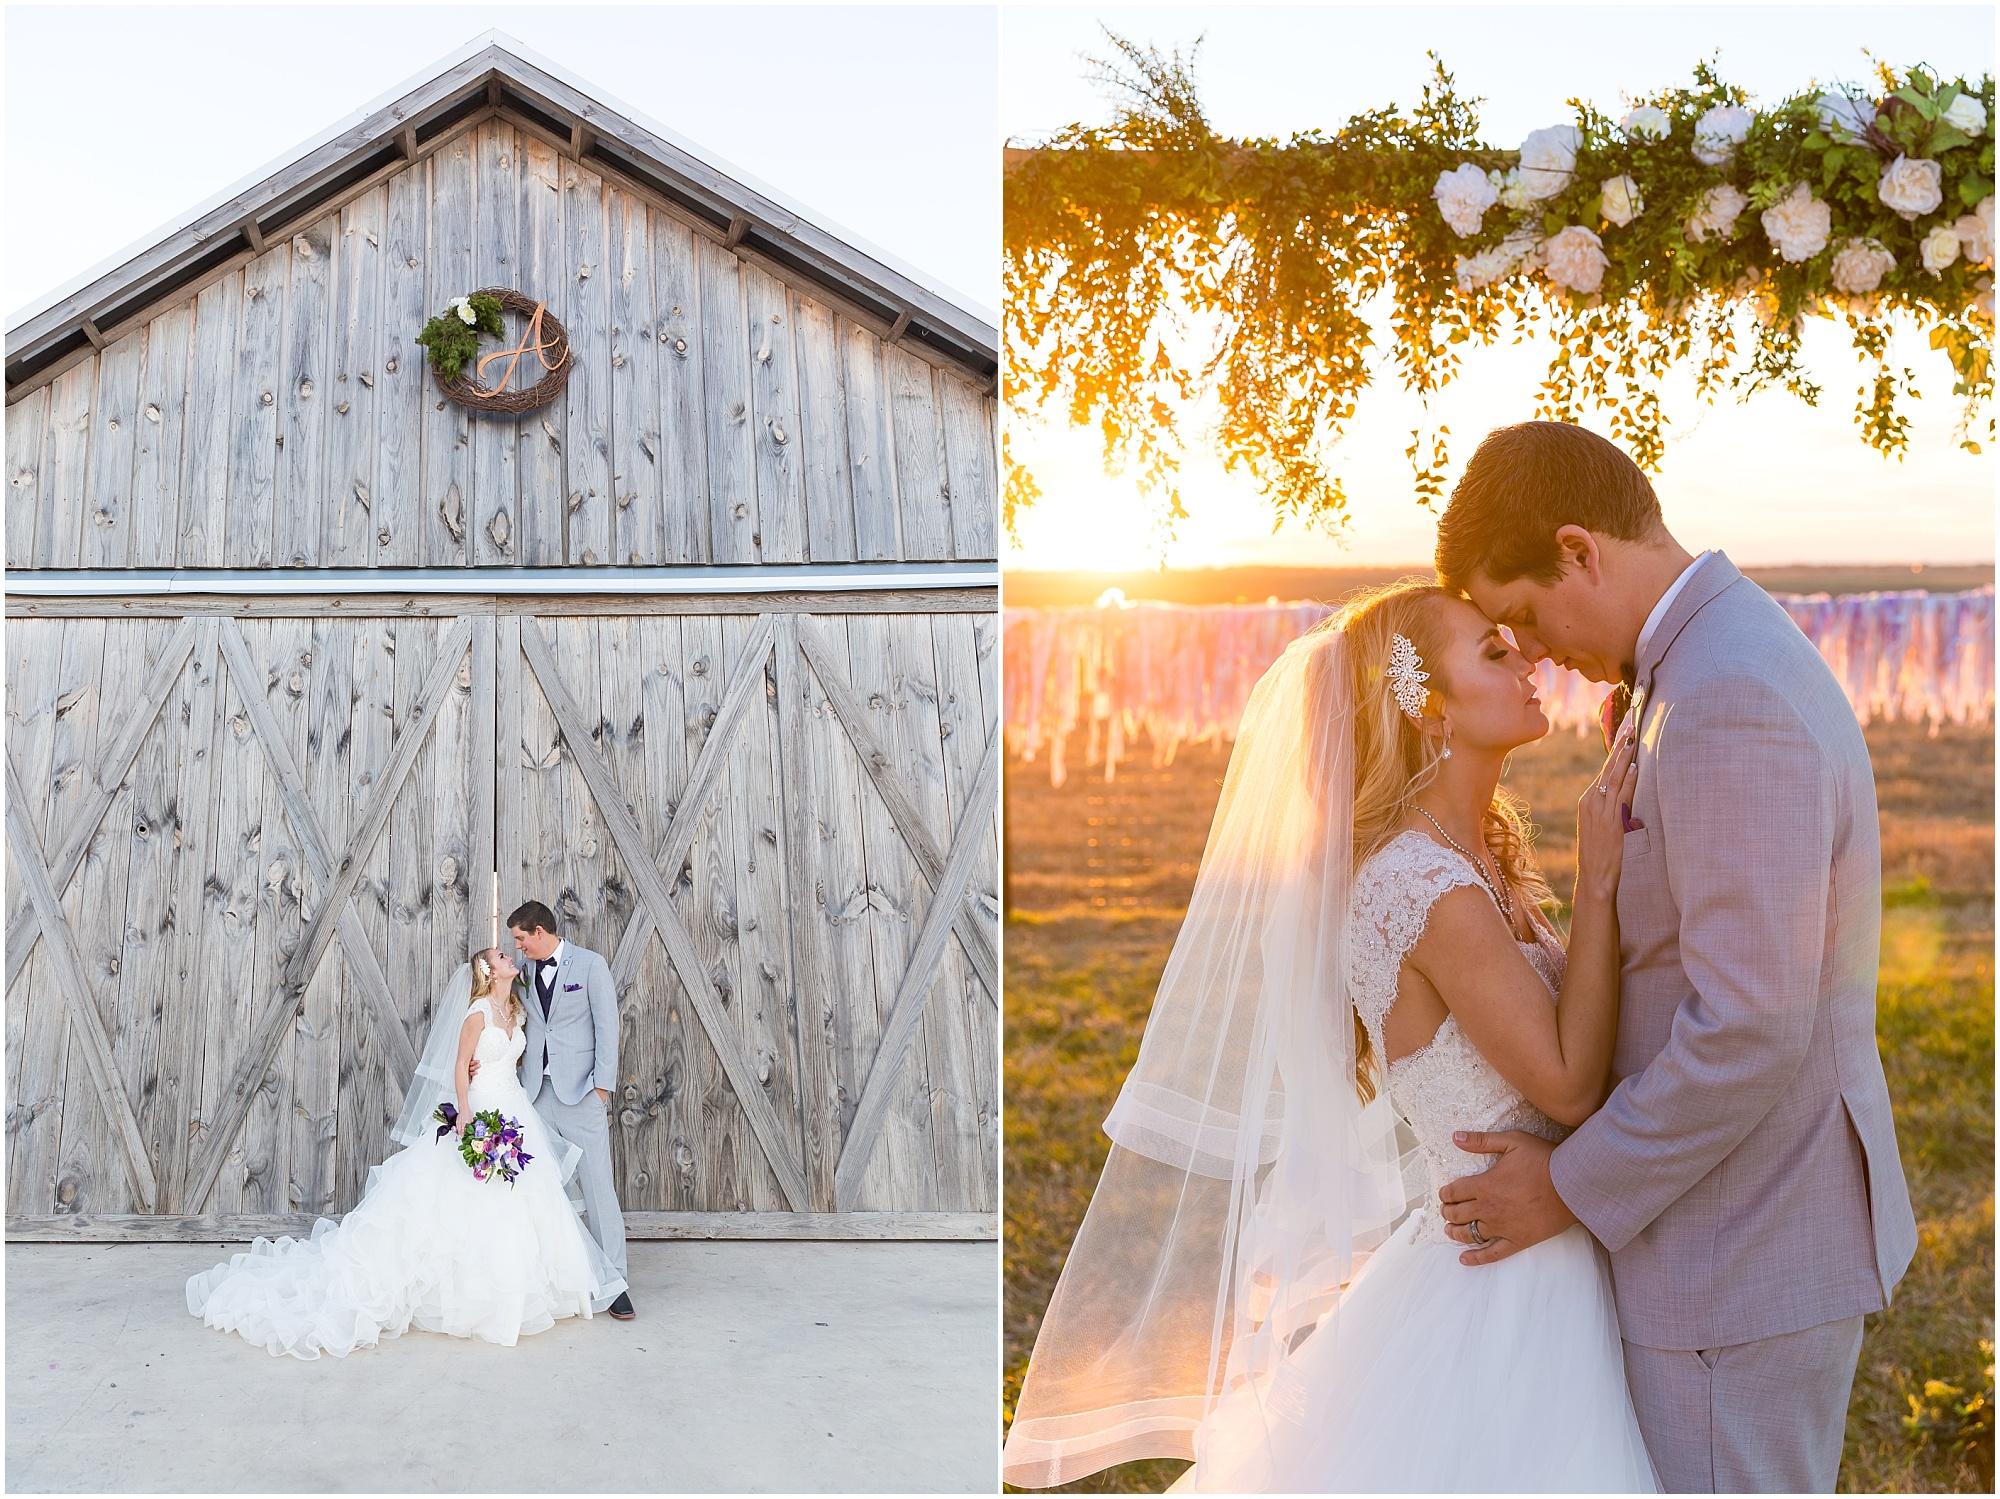 Disney-Inspired-Wedding-Central-Texas_0048.jpg